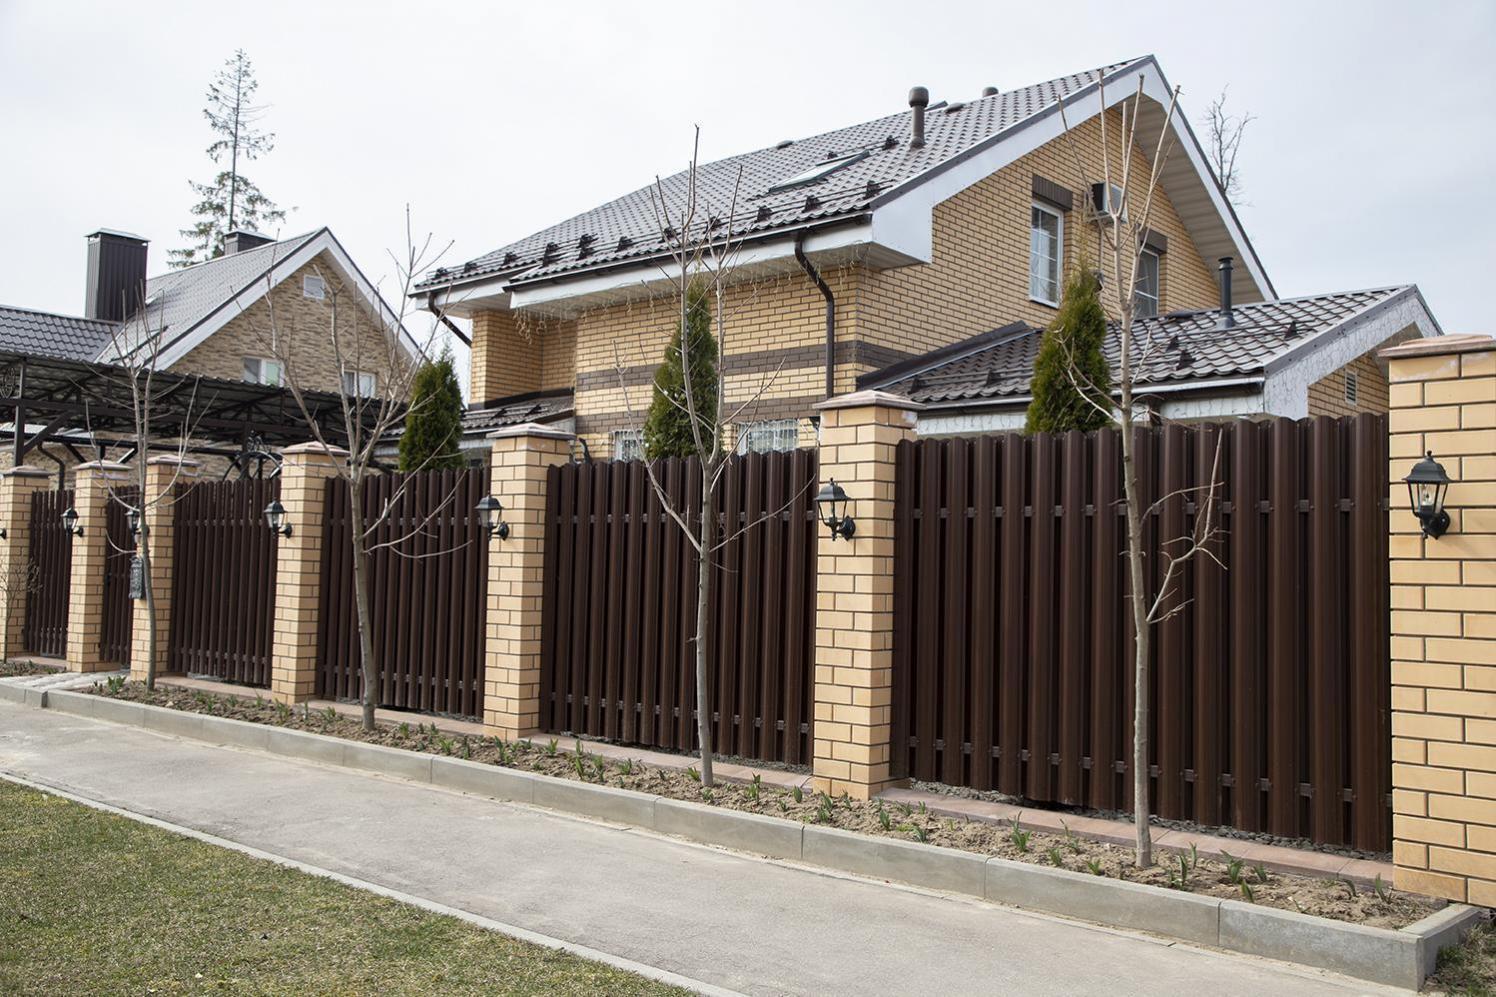 Установка заборов из евроштакетника в москве. цена на забор из евроштакетника под ключ от производителя «дачный забор»